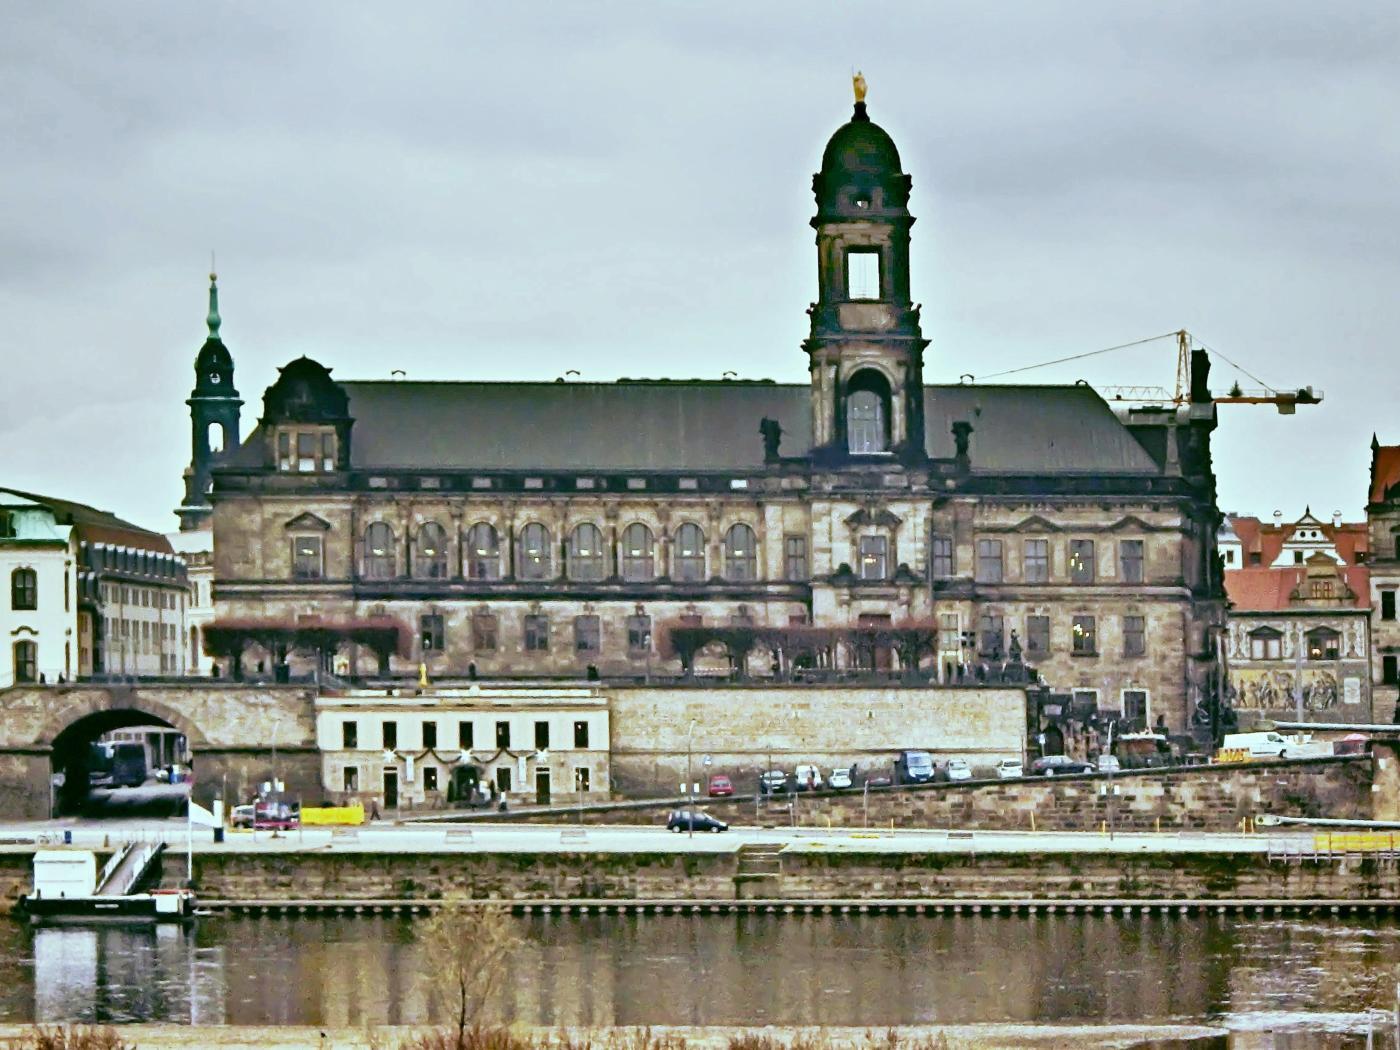 Oberlandesgericht